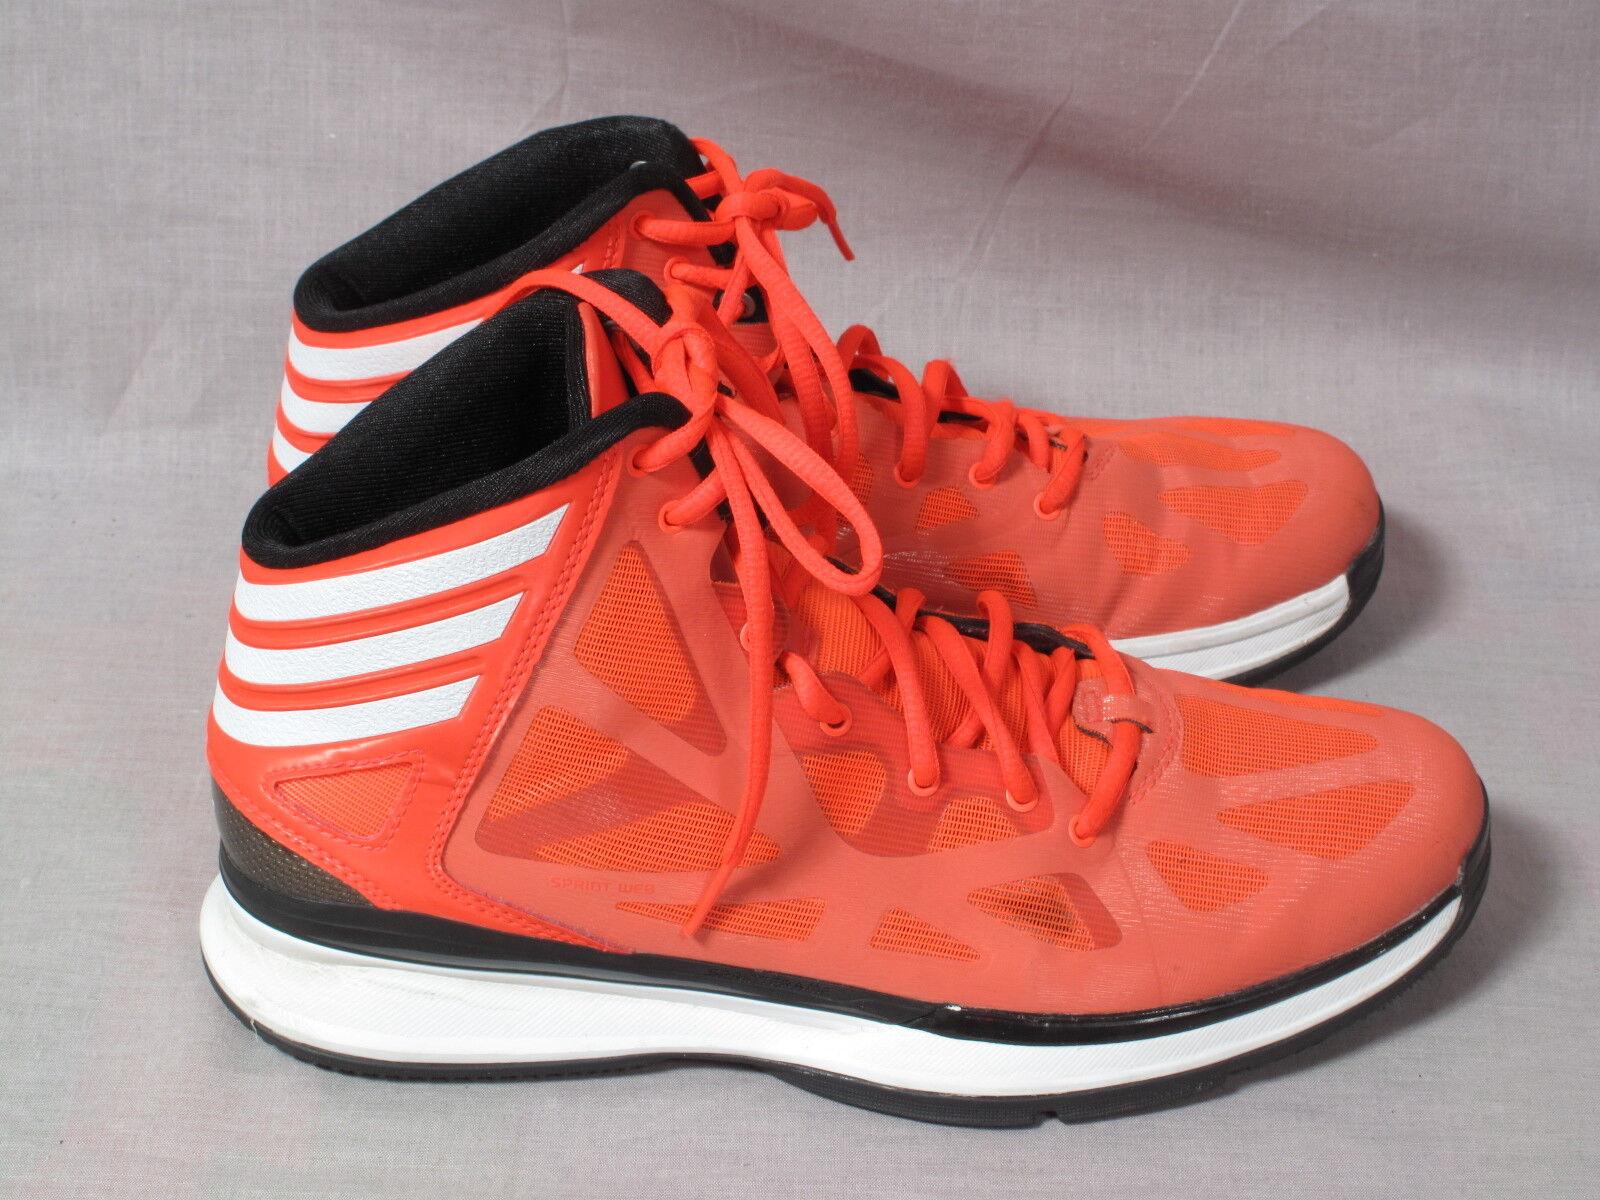 Gli uomini sono le adidas arancione   bianco, 8 8 8 lace up sprint web frame | Terrific Value  8e4c1a